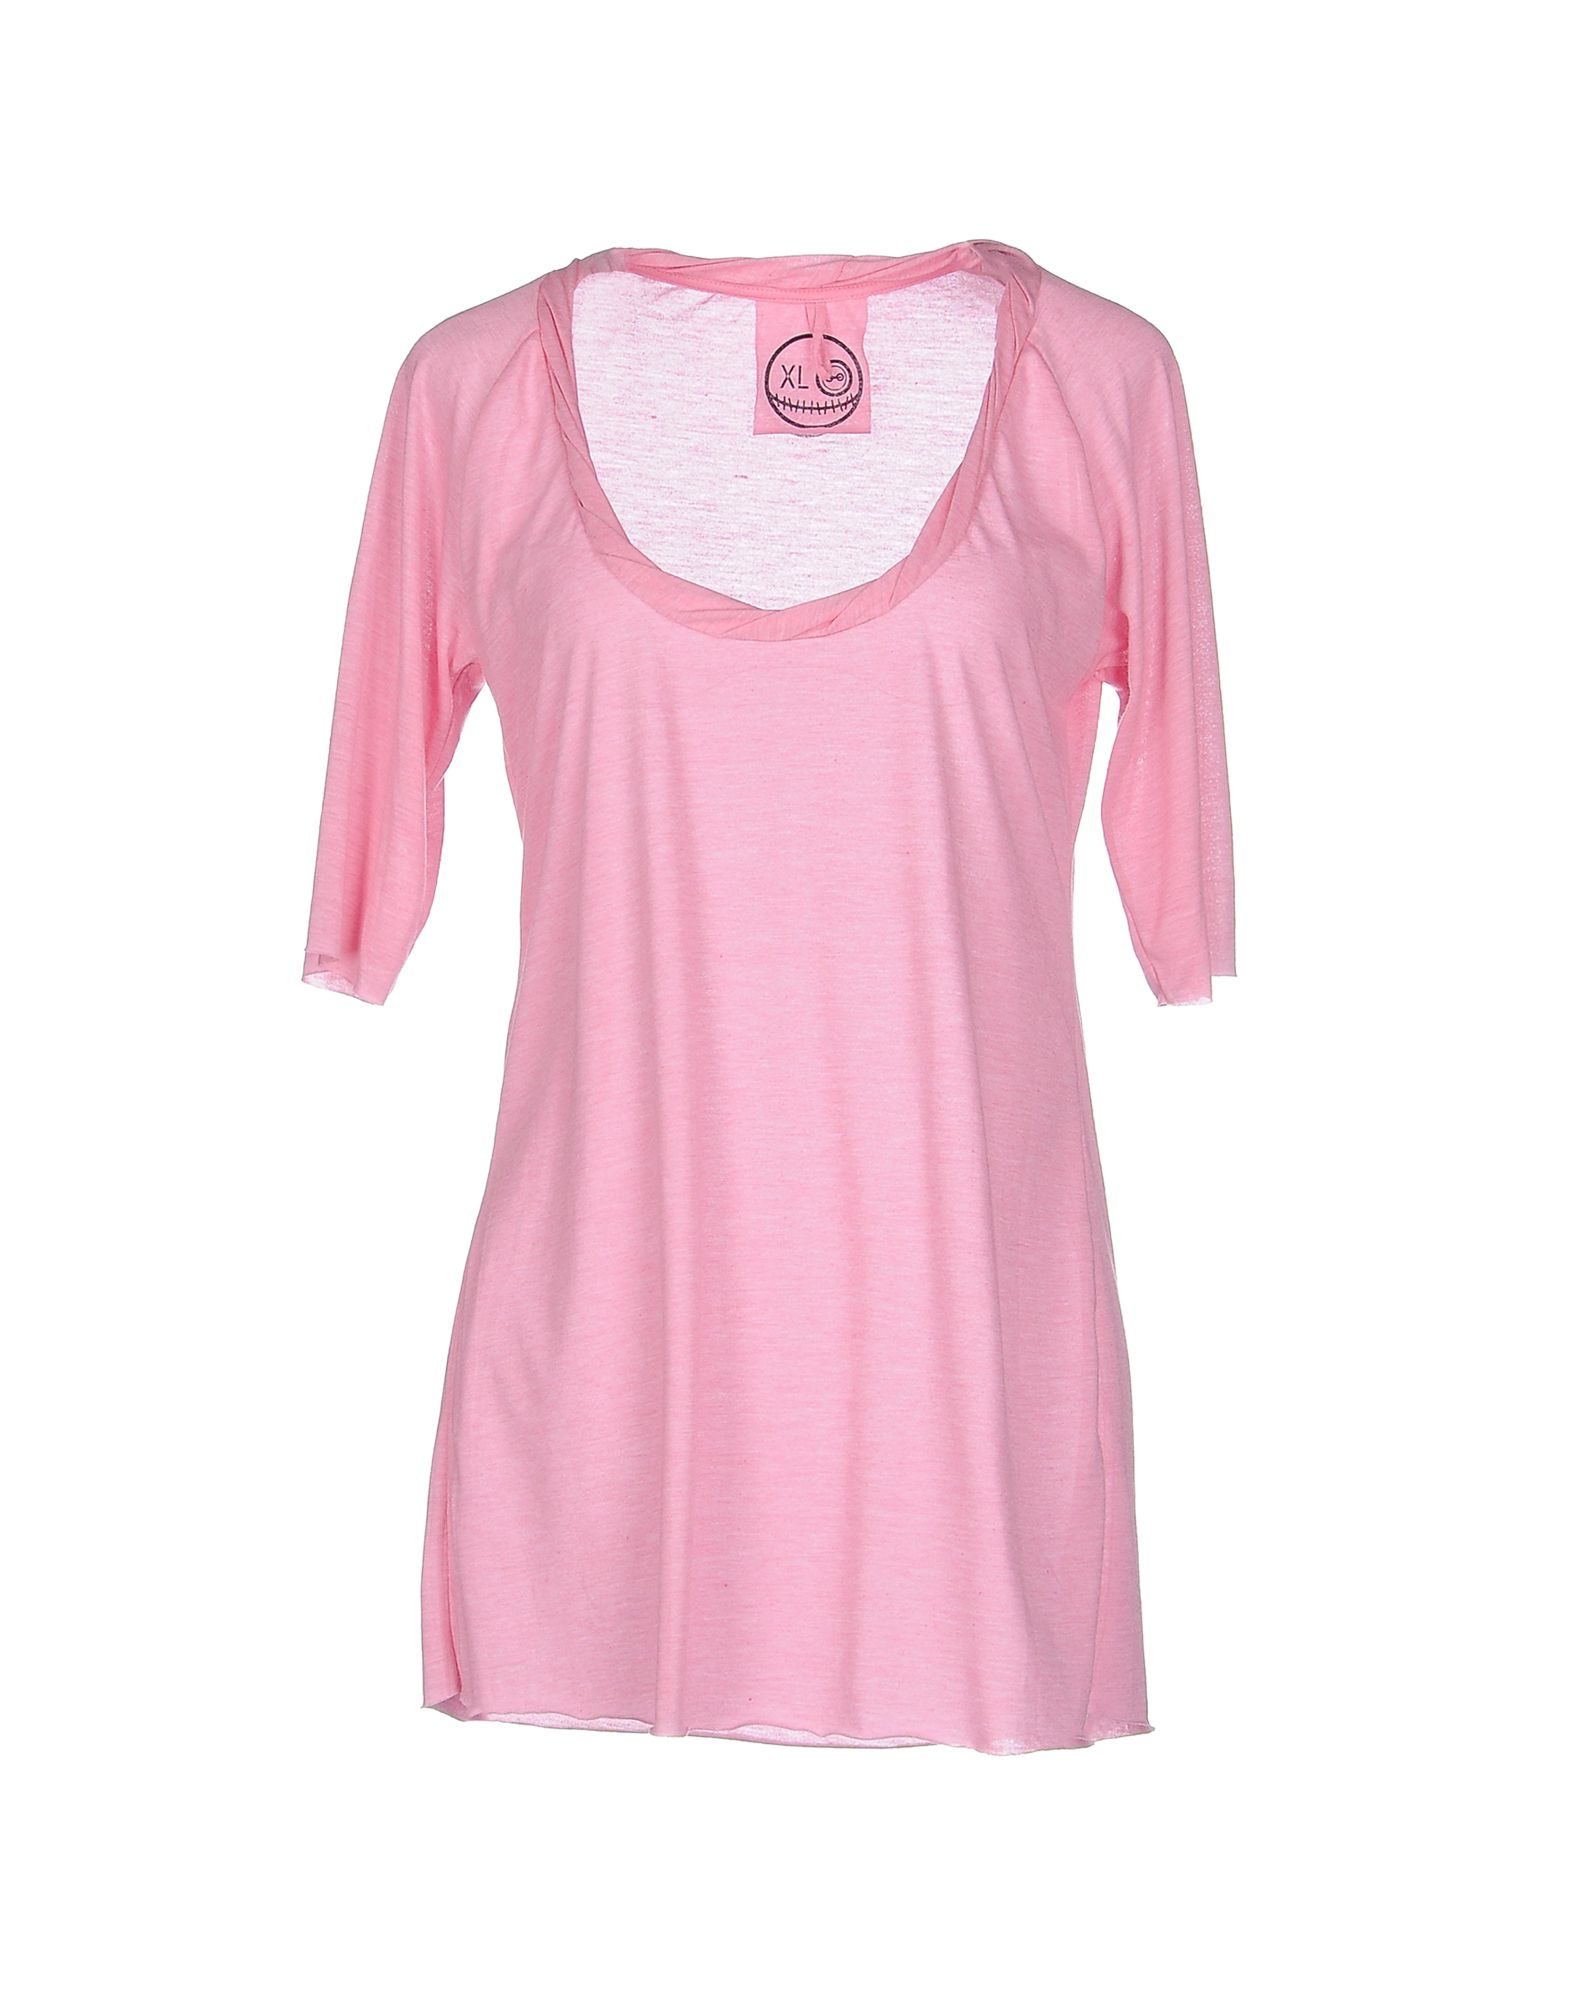 THE MUA MUA DOLLS Damen T-shirts Farbe Rosa Größe 7